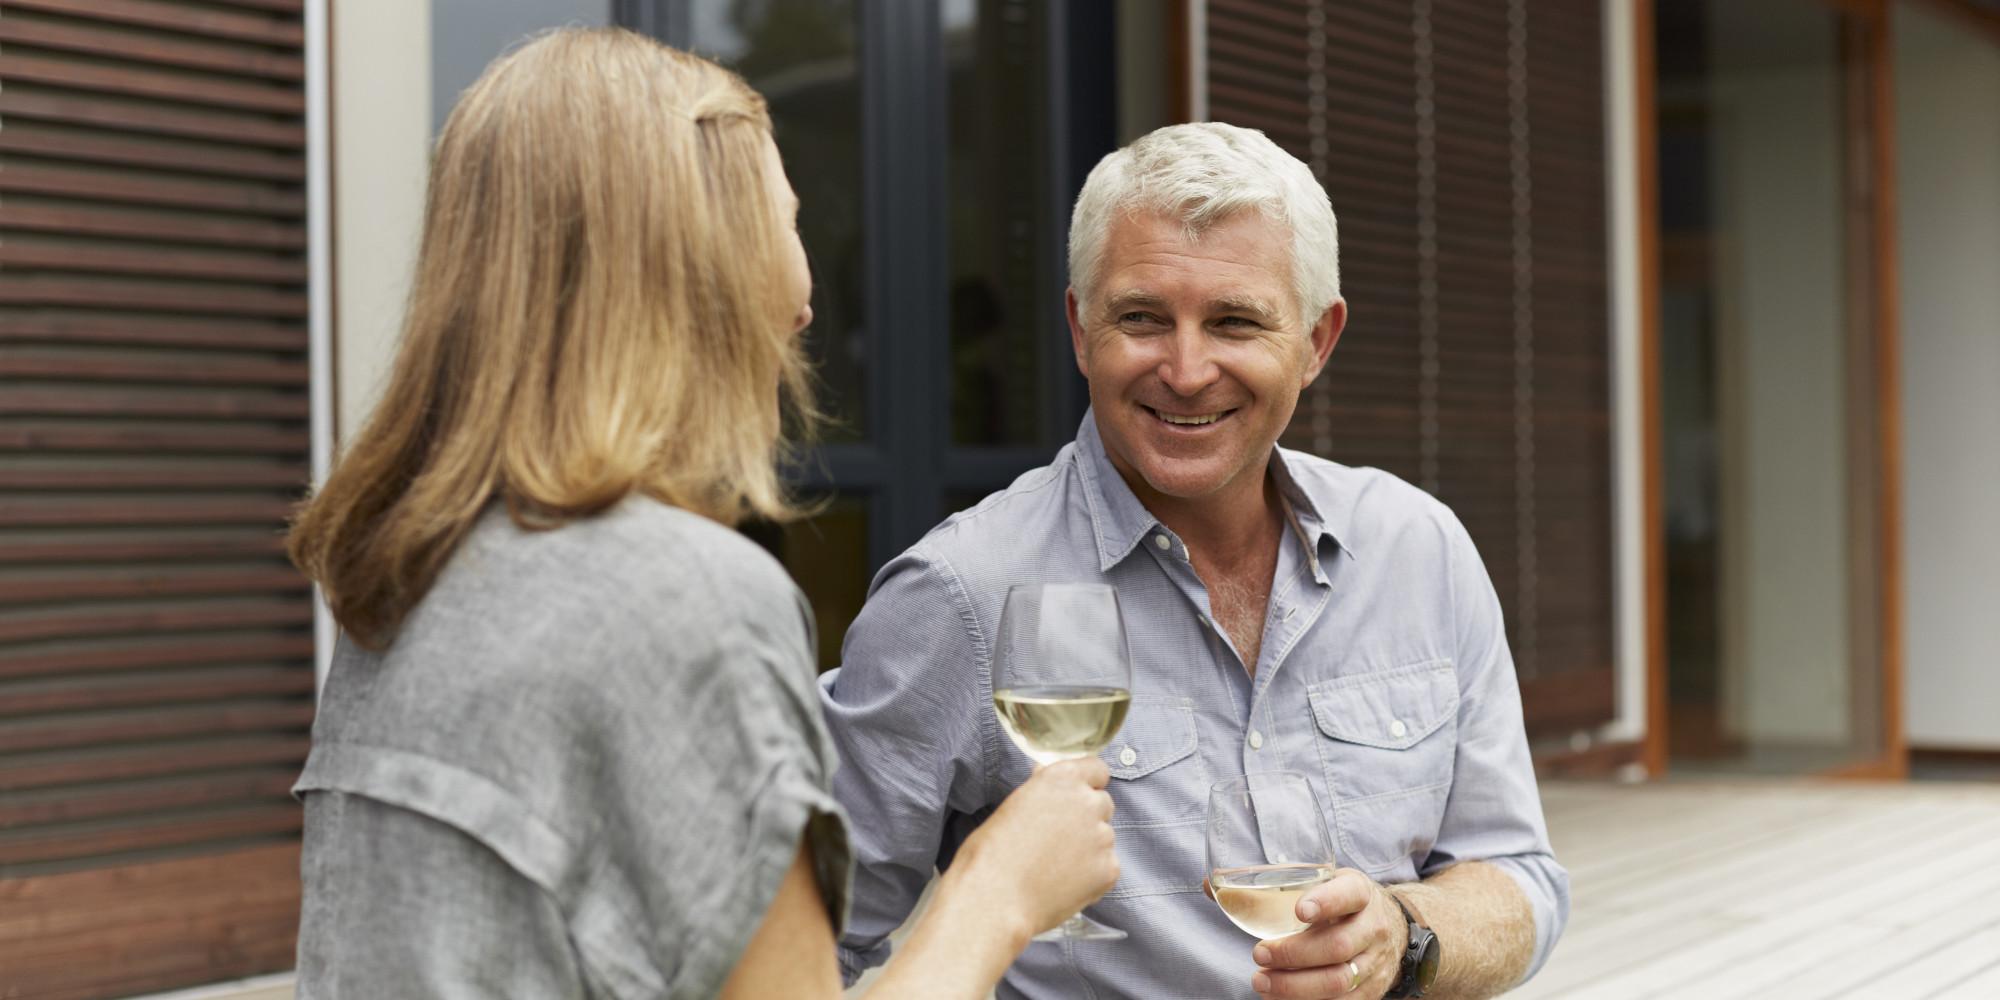 Lost Hills CA Single Men Over 50